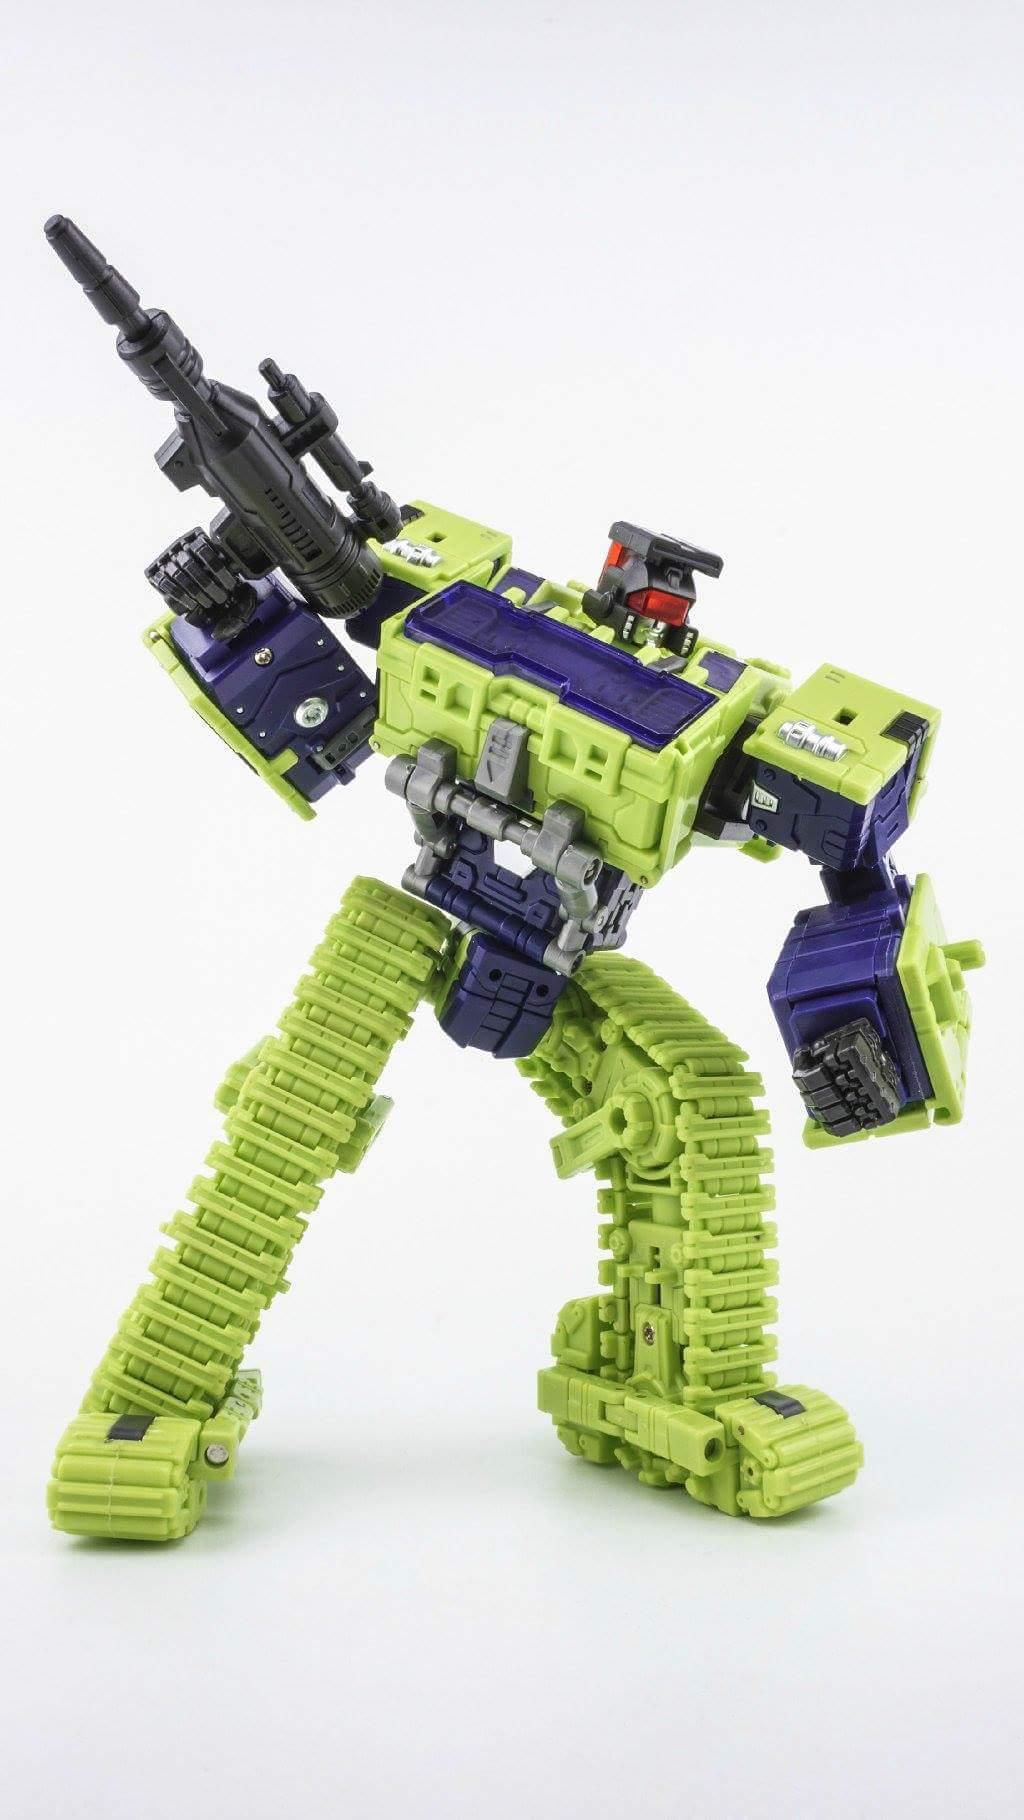 [Toyworld] Produit Tiers - Jouet TW-C Constructor aka Devastator/Dévastateur (Version vert G1 et jaune G2) - Page 3 KbyF3I3t